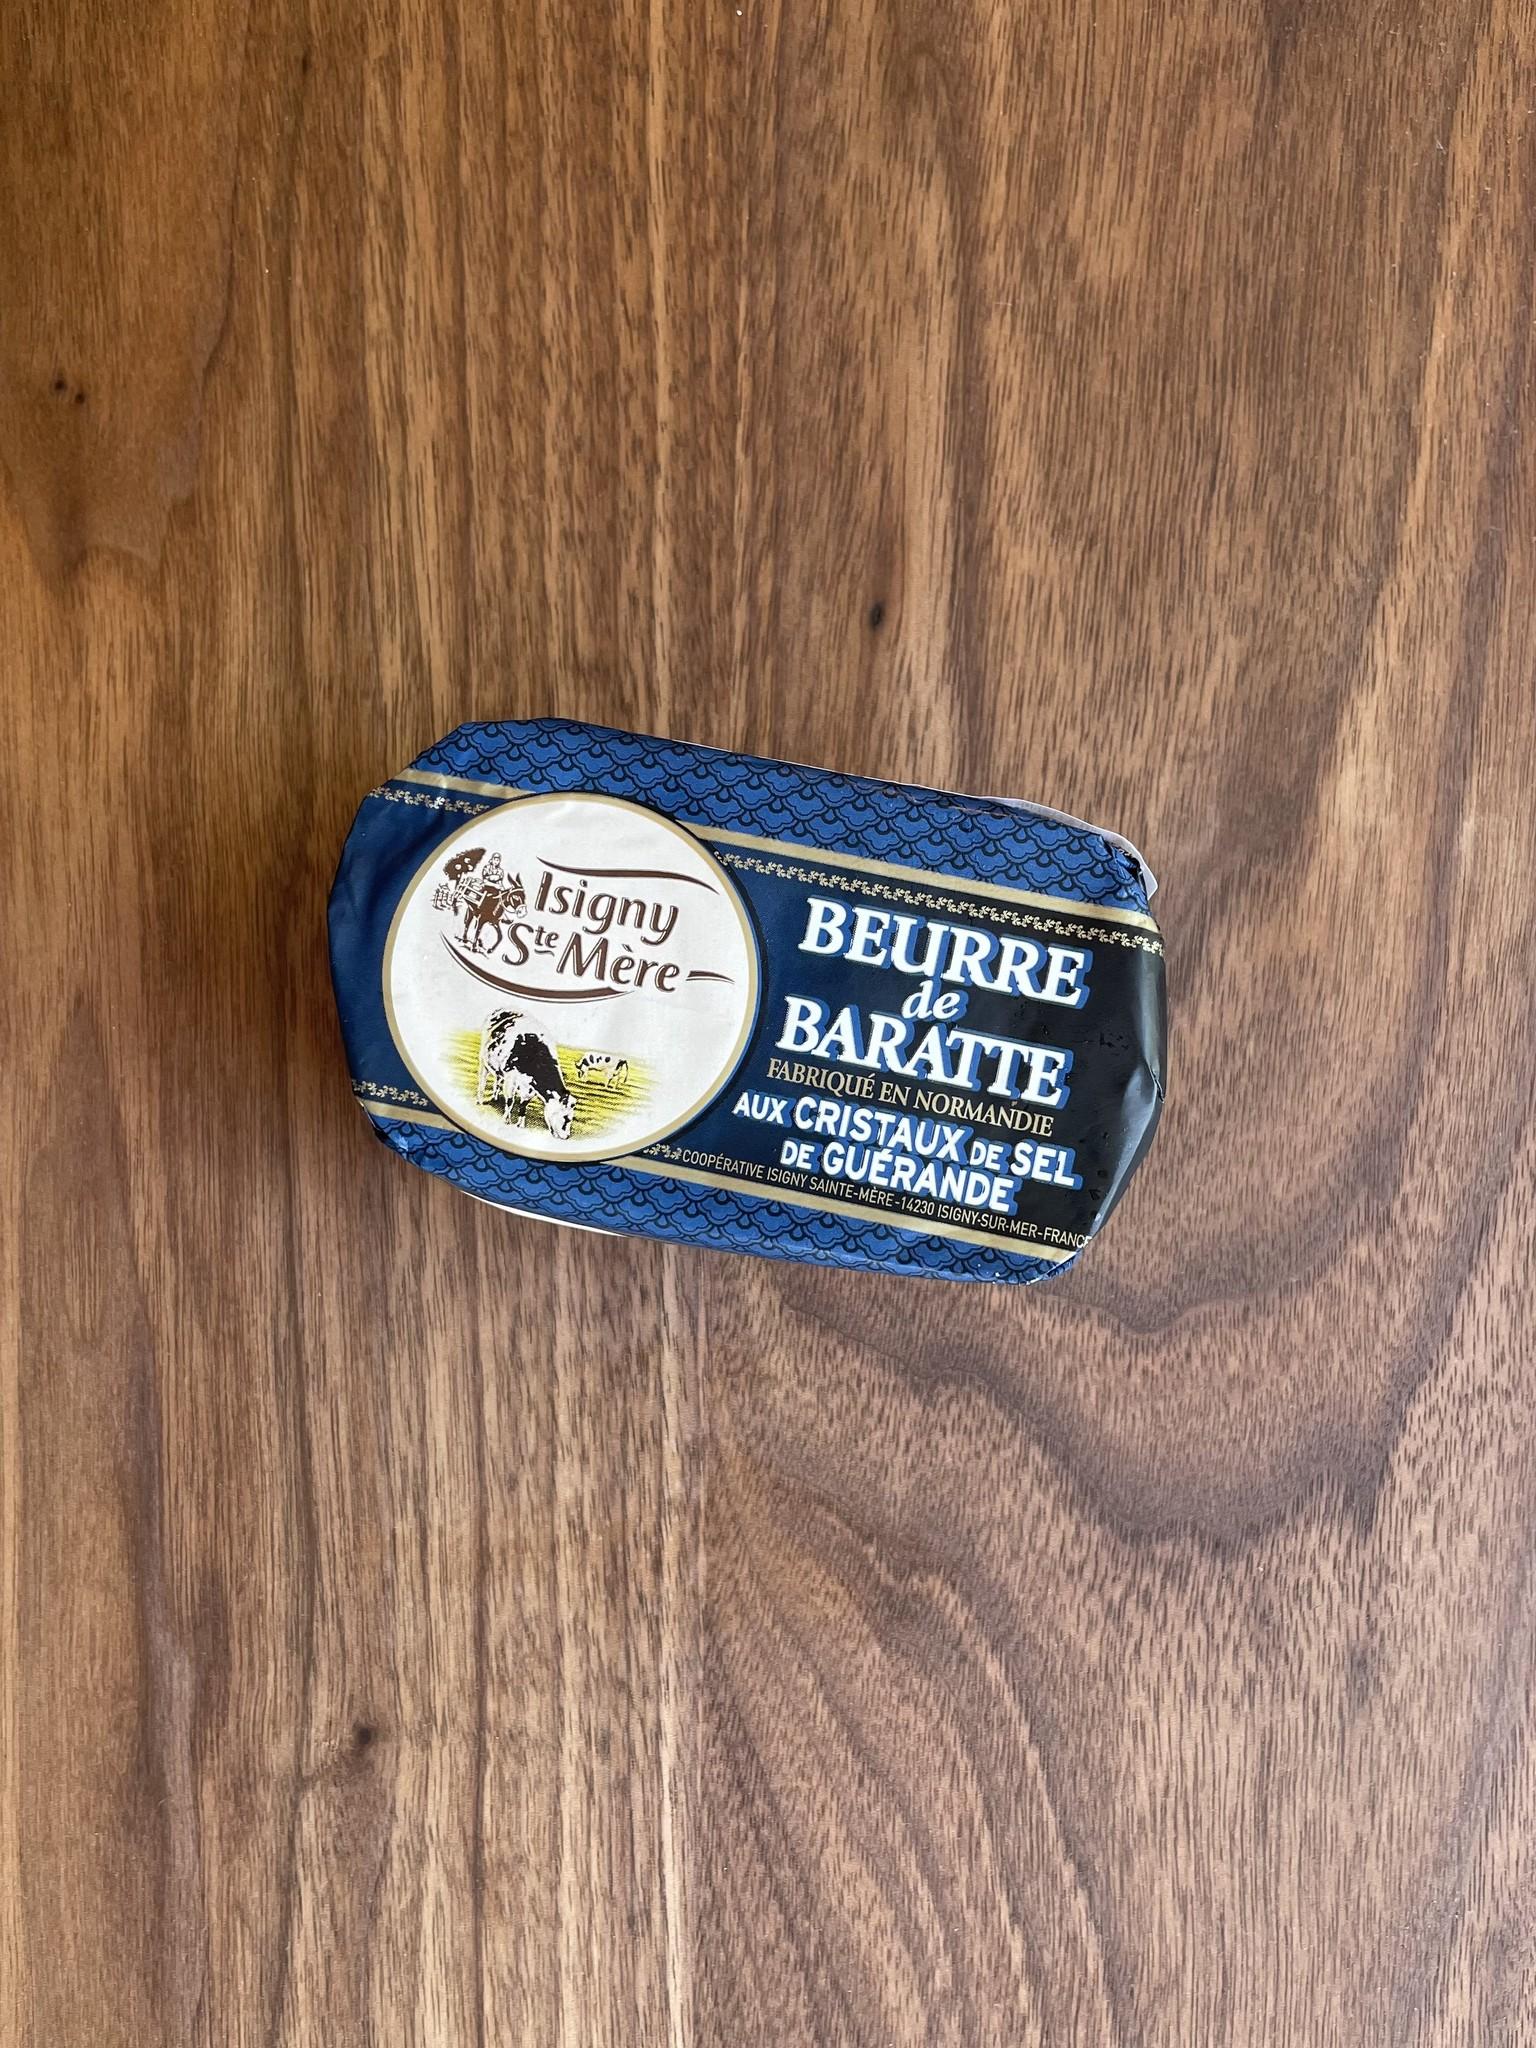 Isigny de Mer Beurre de Baratte Salted Butter with Fleur de Sel-1